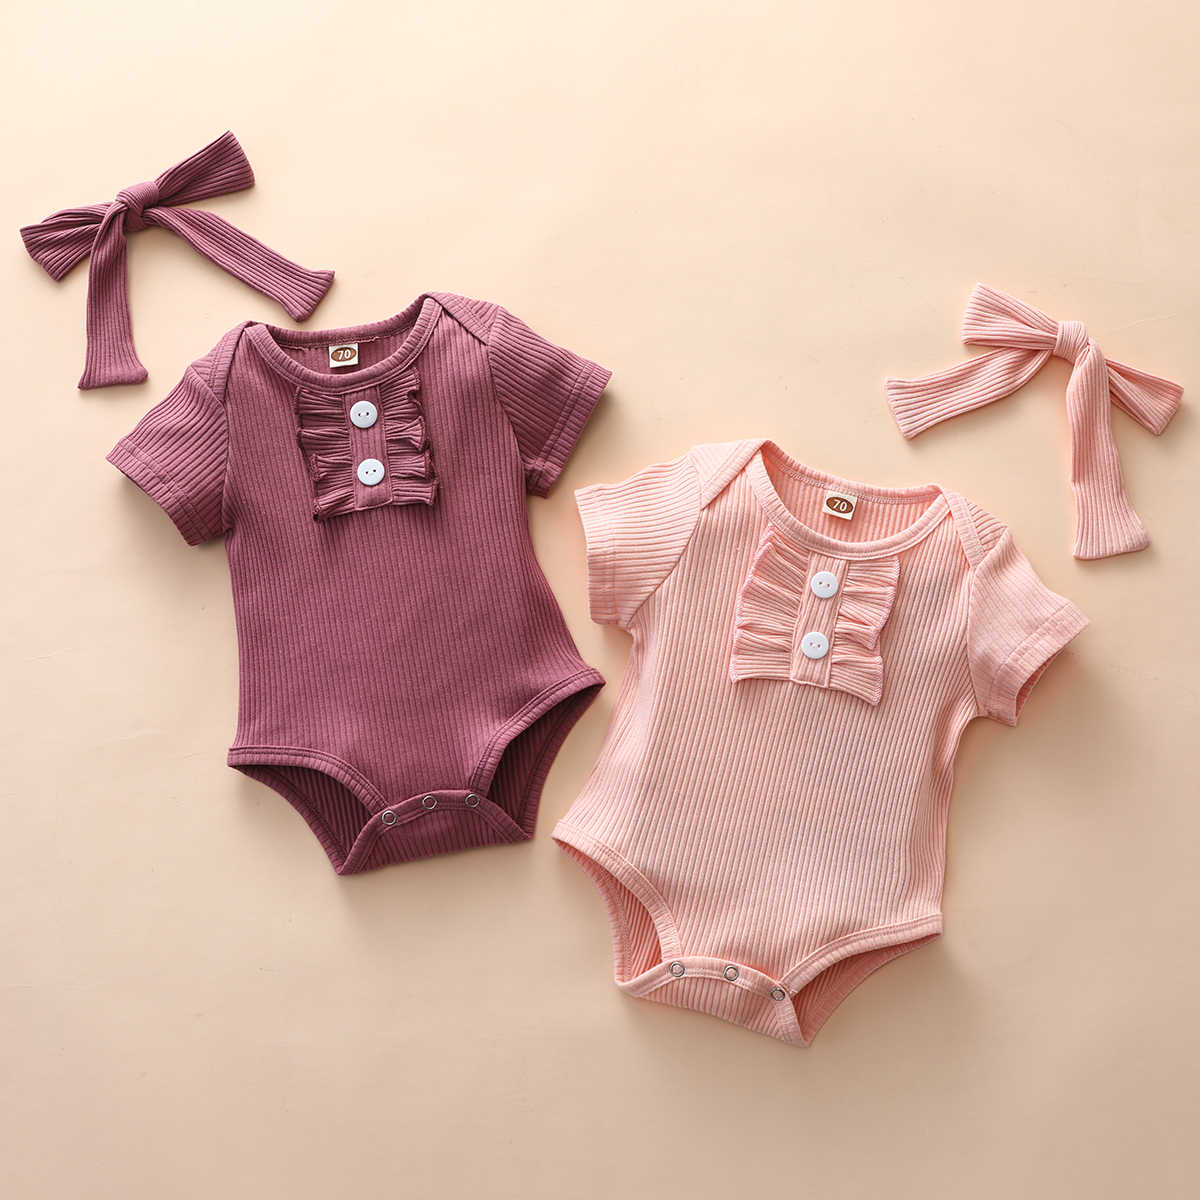 2020 Baby Zomer Kleding Pasgeboren Baby Meisjes Bodysuit Solid Geribbelde Jumpsuits Korte Mouwen Ruches Hals Speelpakjes Hoofdband